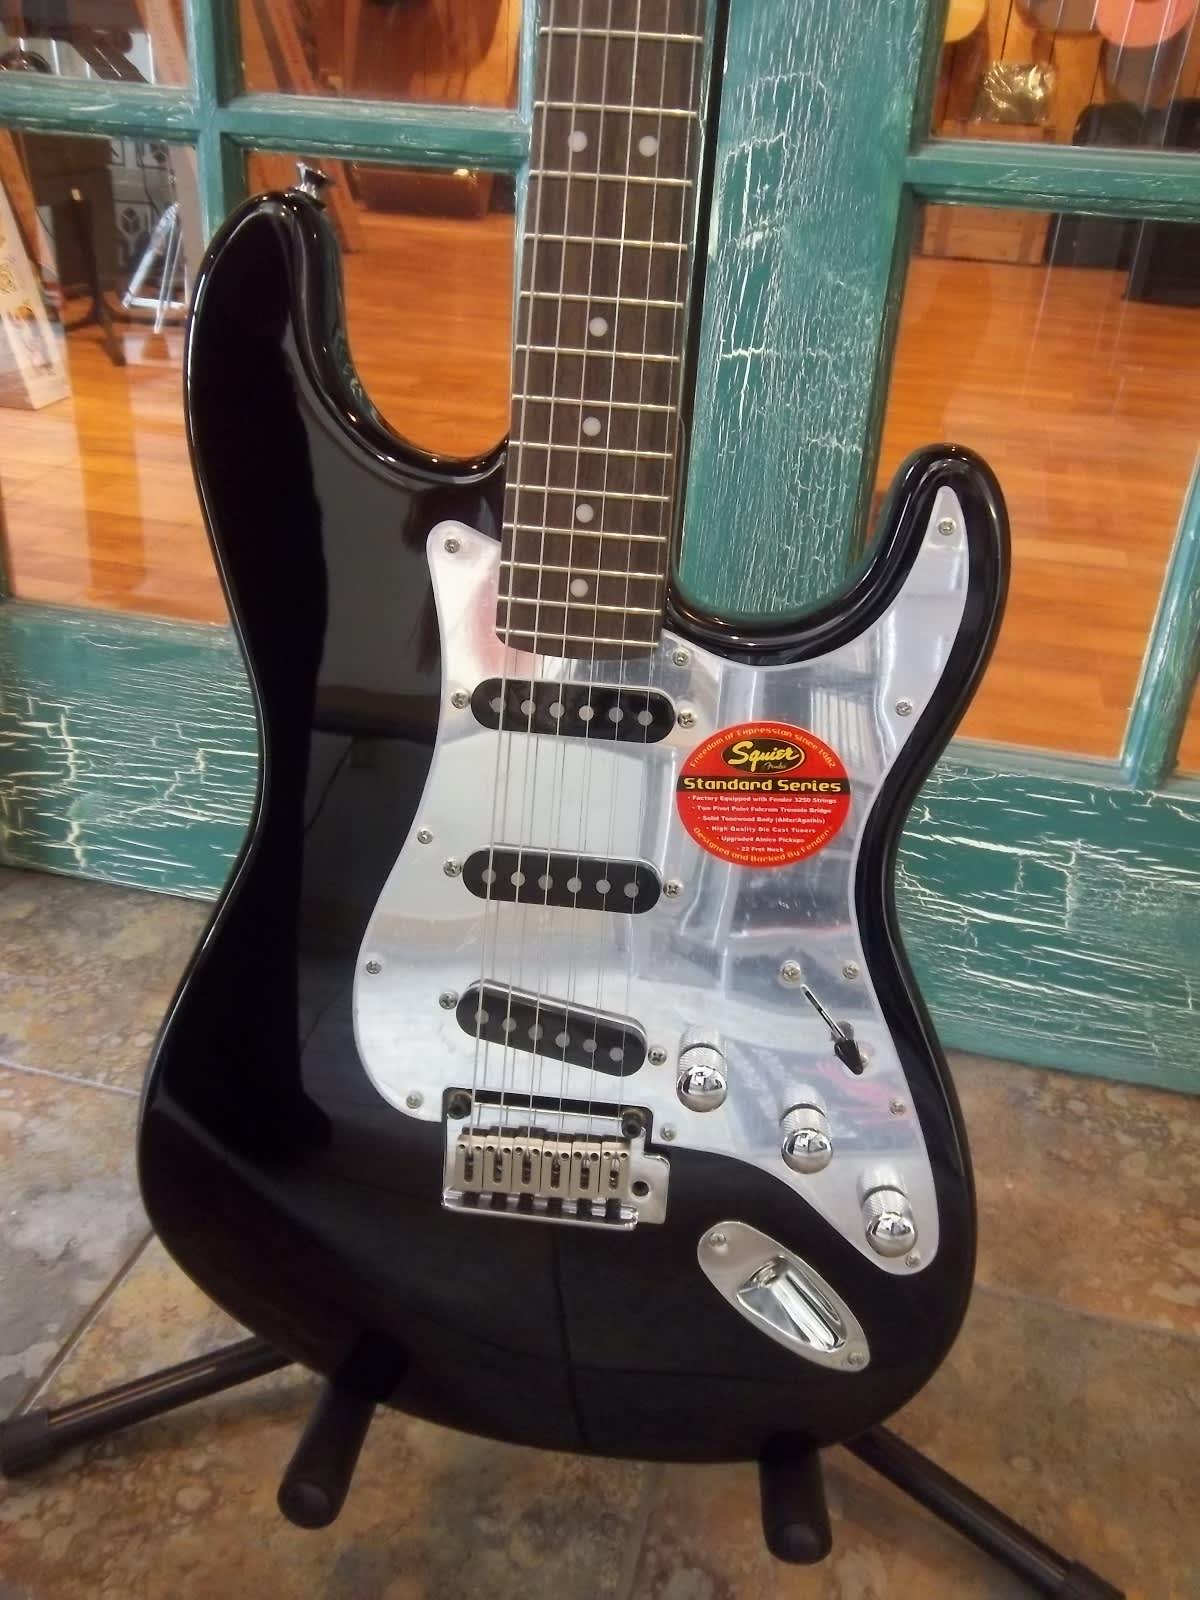 Tolle Standard Gitarre Fender Stratocaster Schaltplan Fotos ...